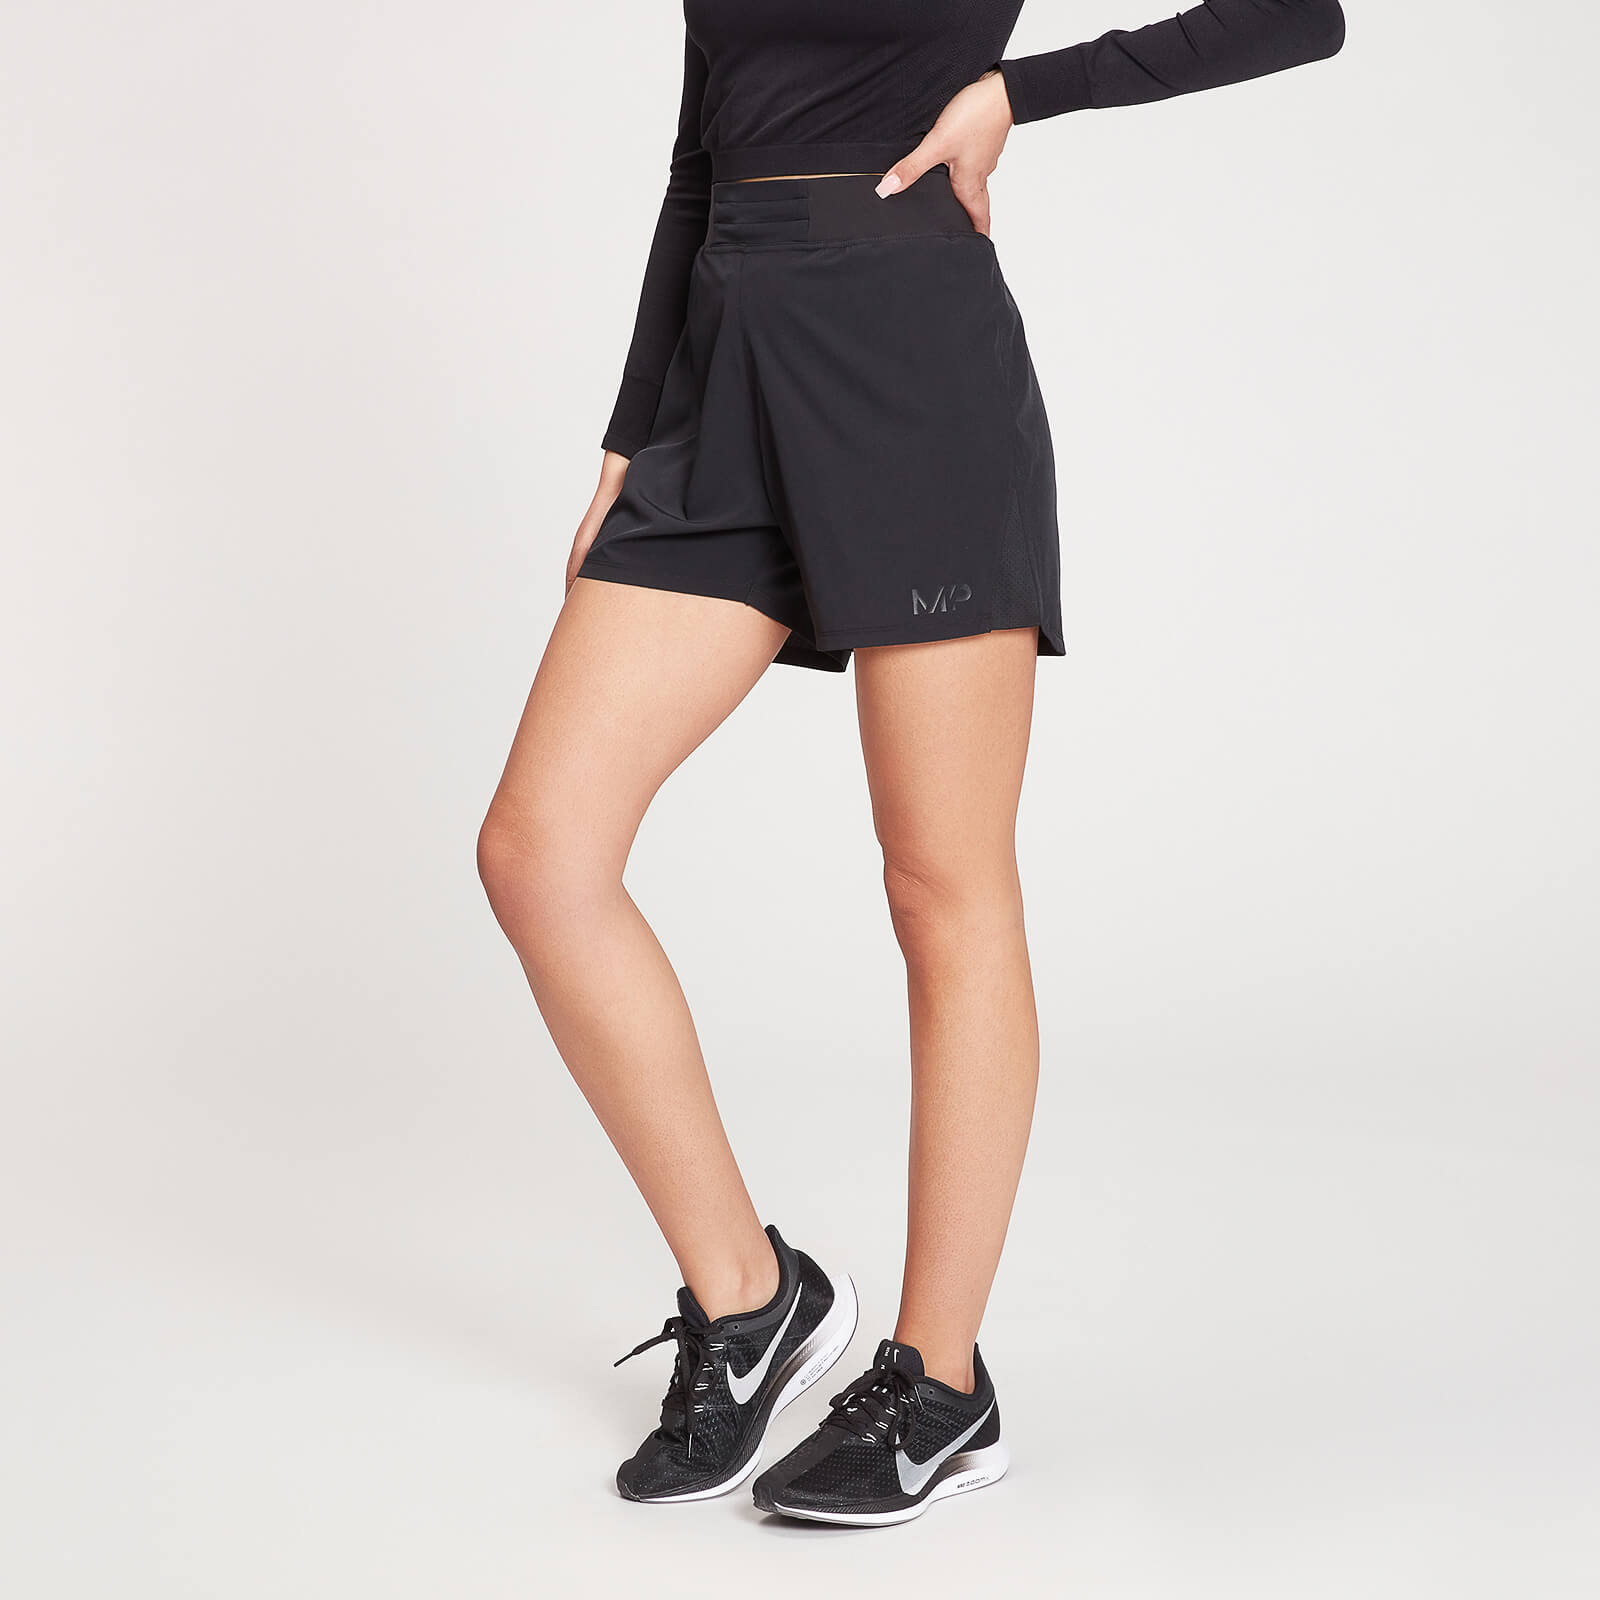 Купить MP Women's Agility Training Shorts - Black - XXS, Myprotein International